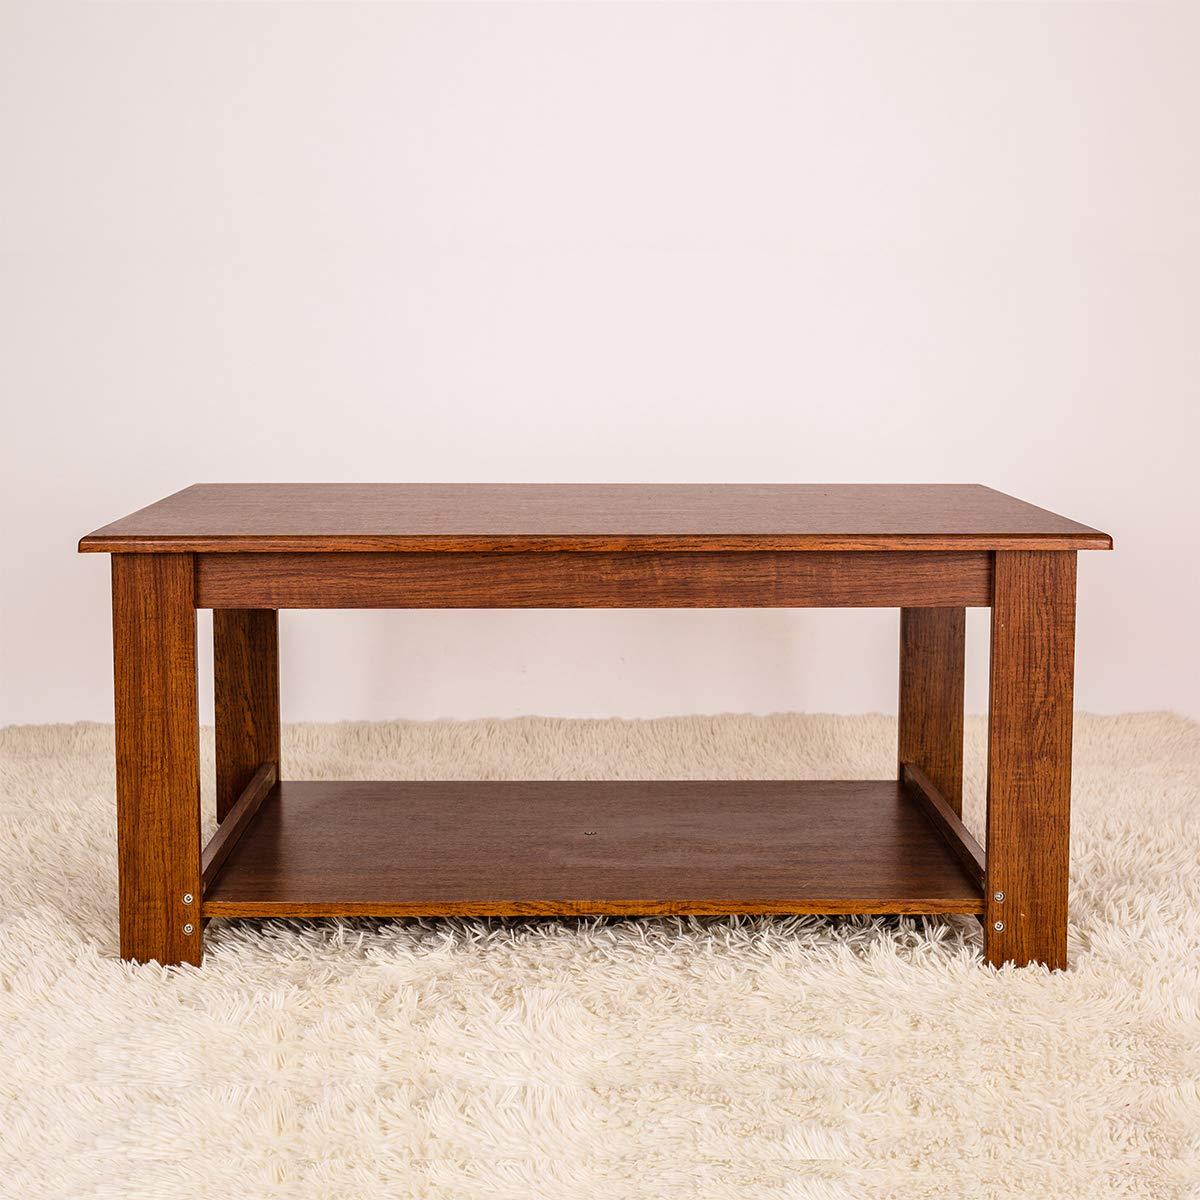 Amazon.com: GRAFZEAL Coffee Table, Sofa Cocktail Table with ...